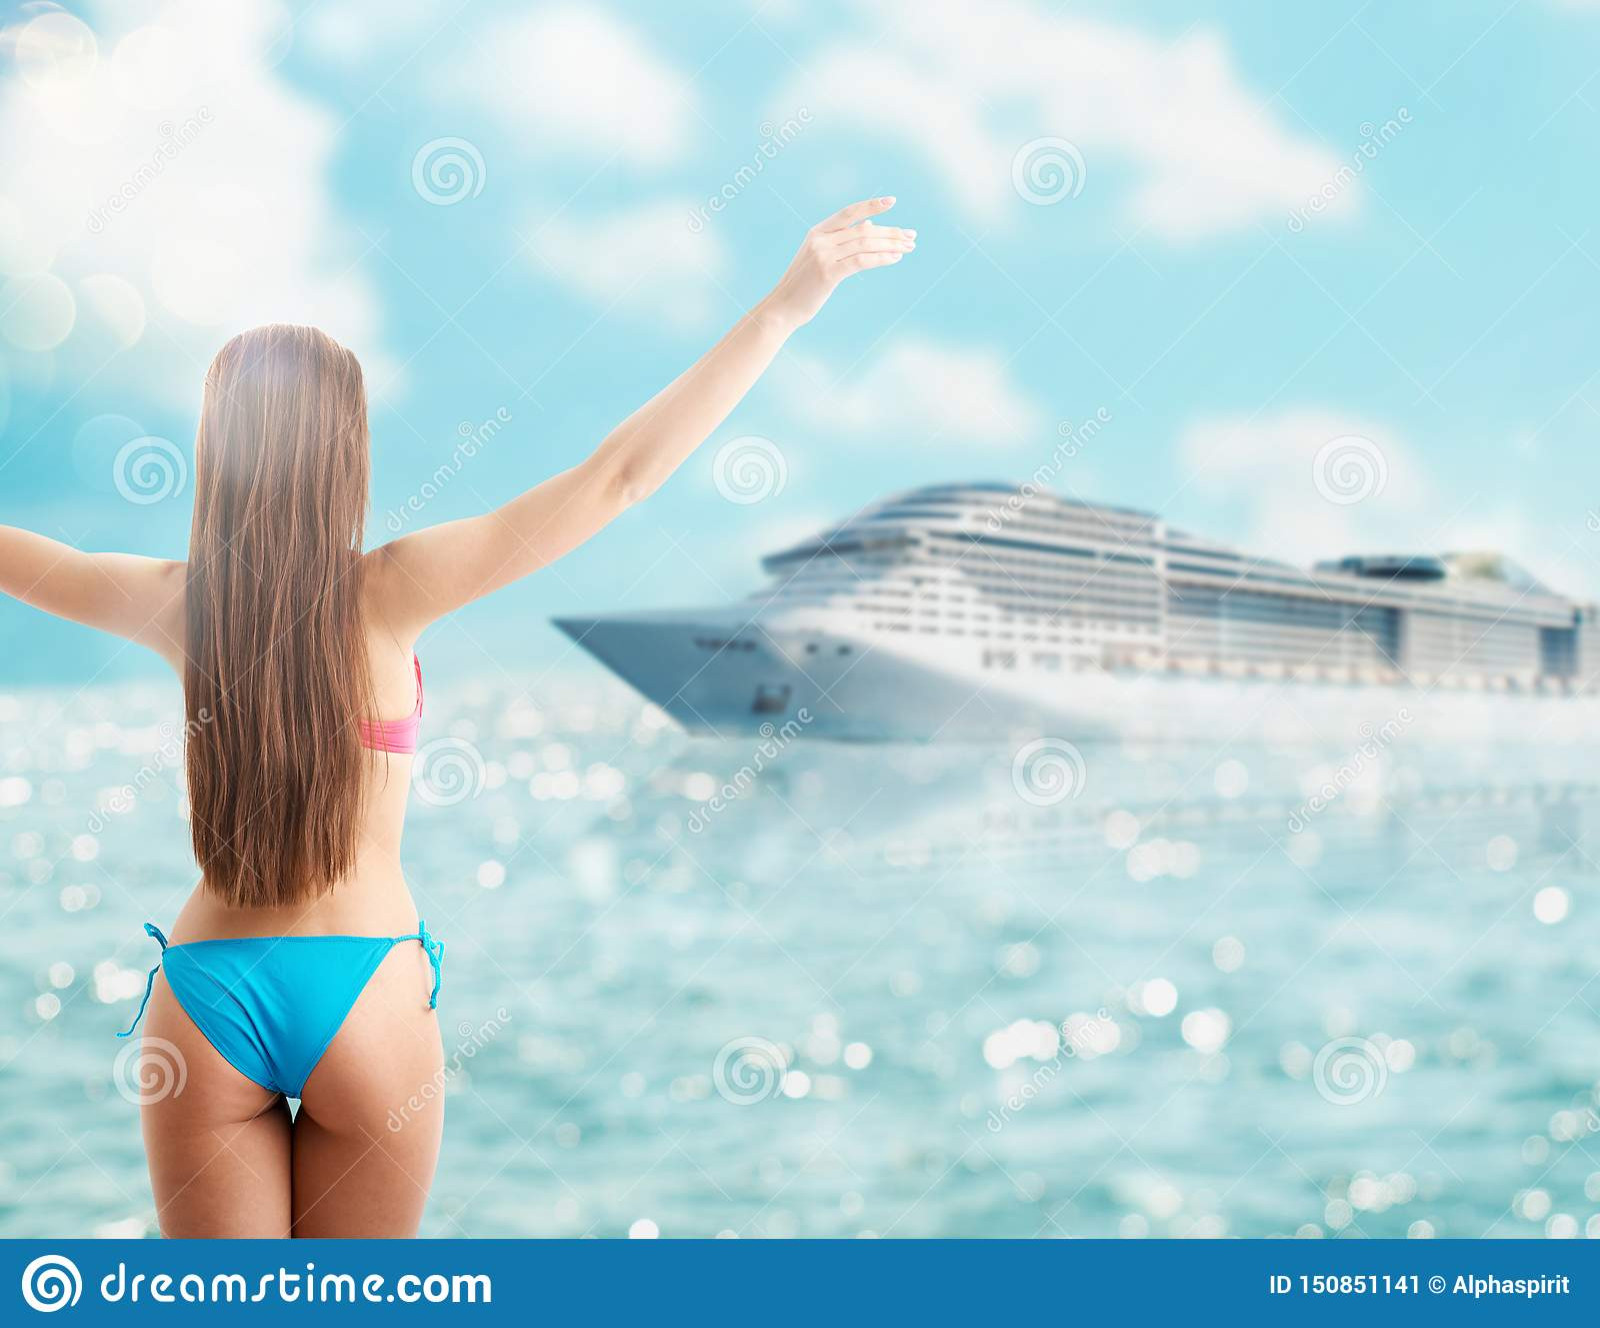 pictures Cruiseship bikini